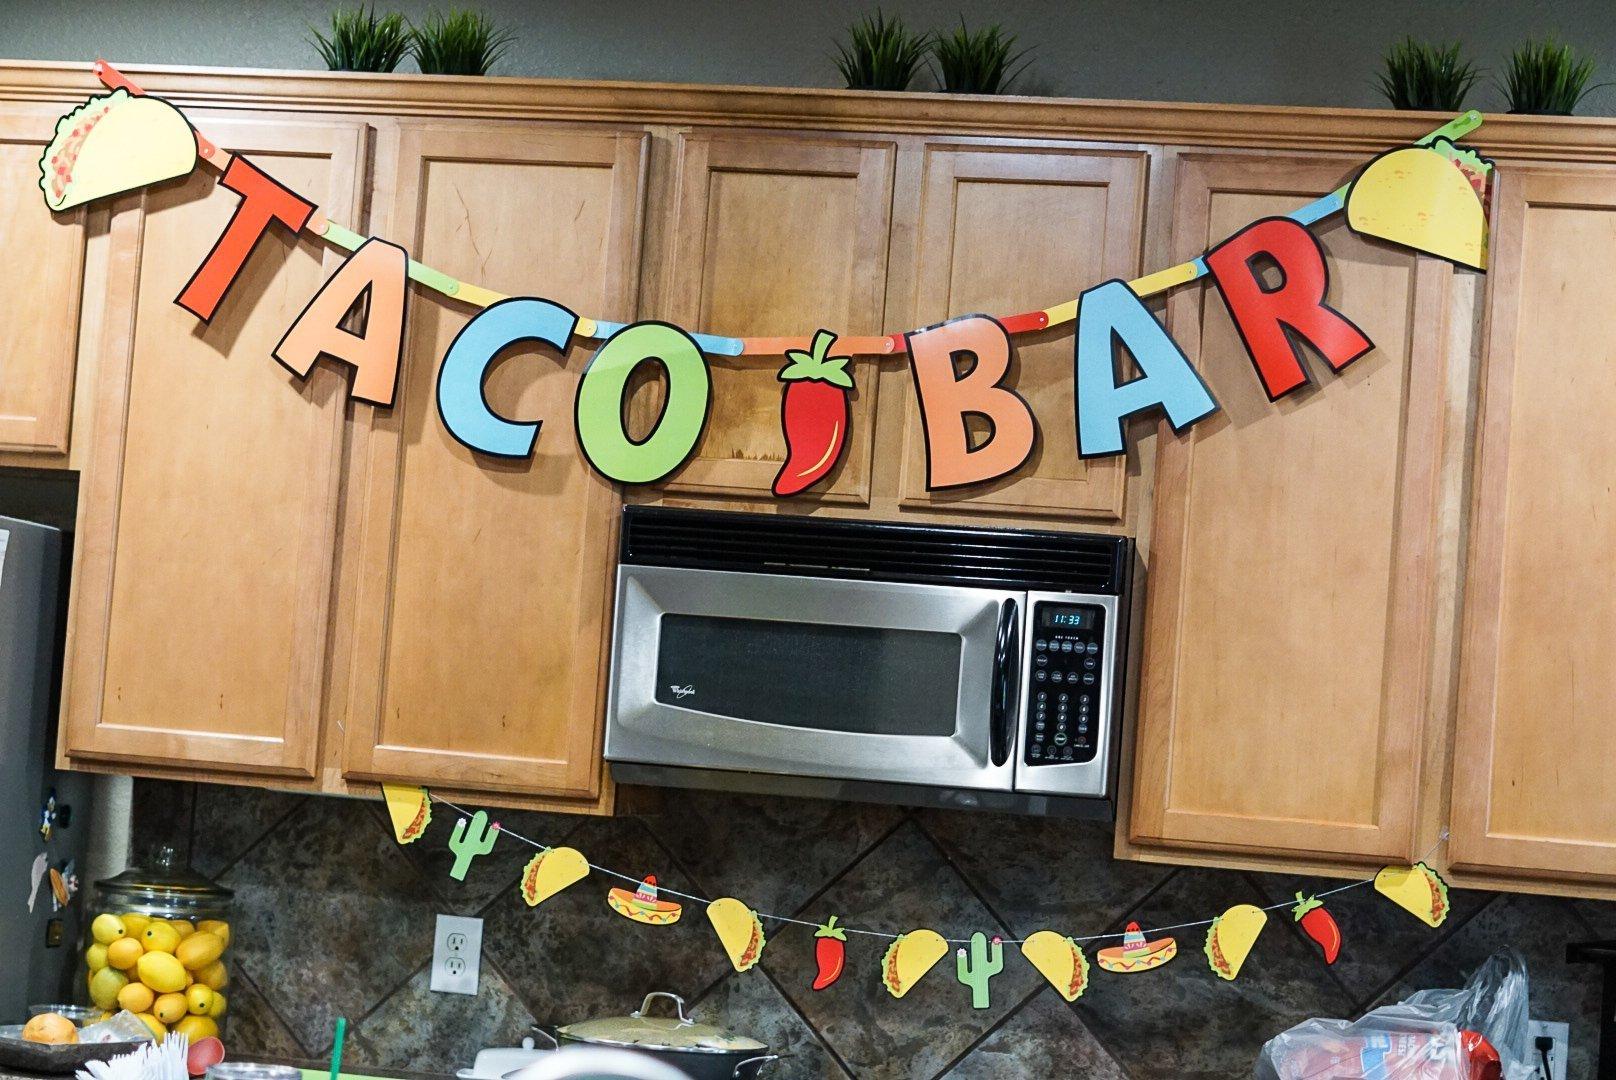 Taco Bar Banner - Simply Madisynn